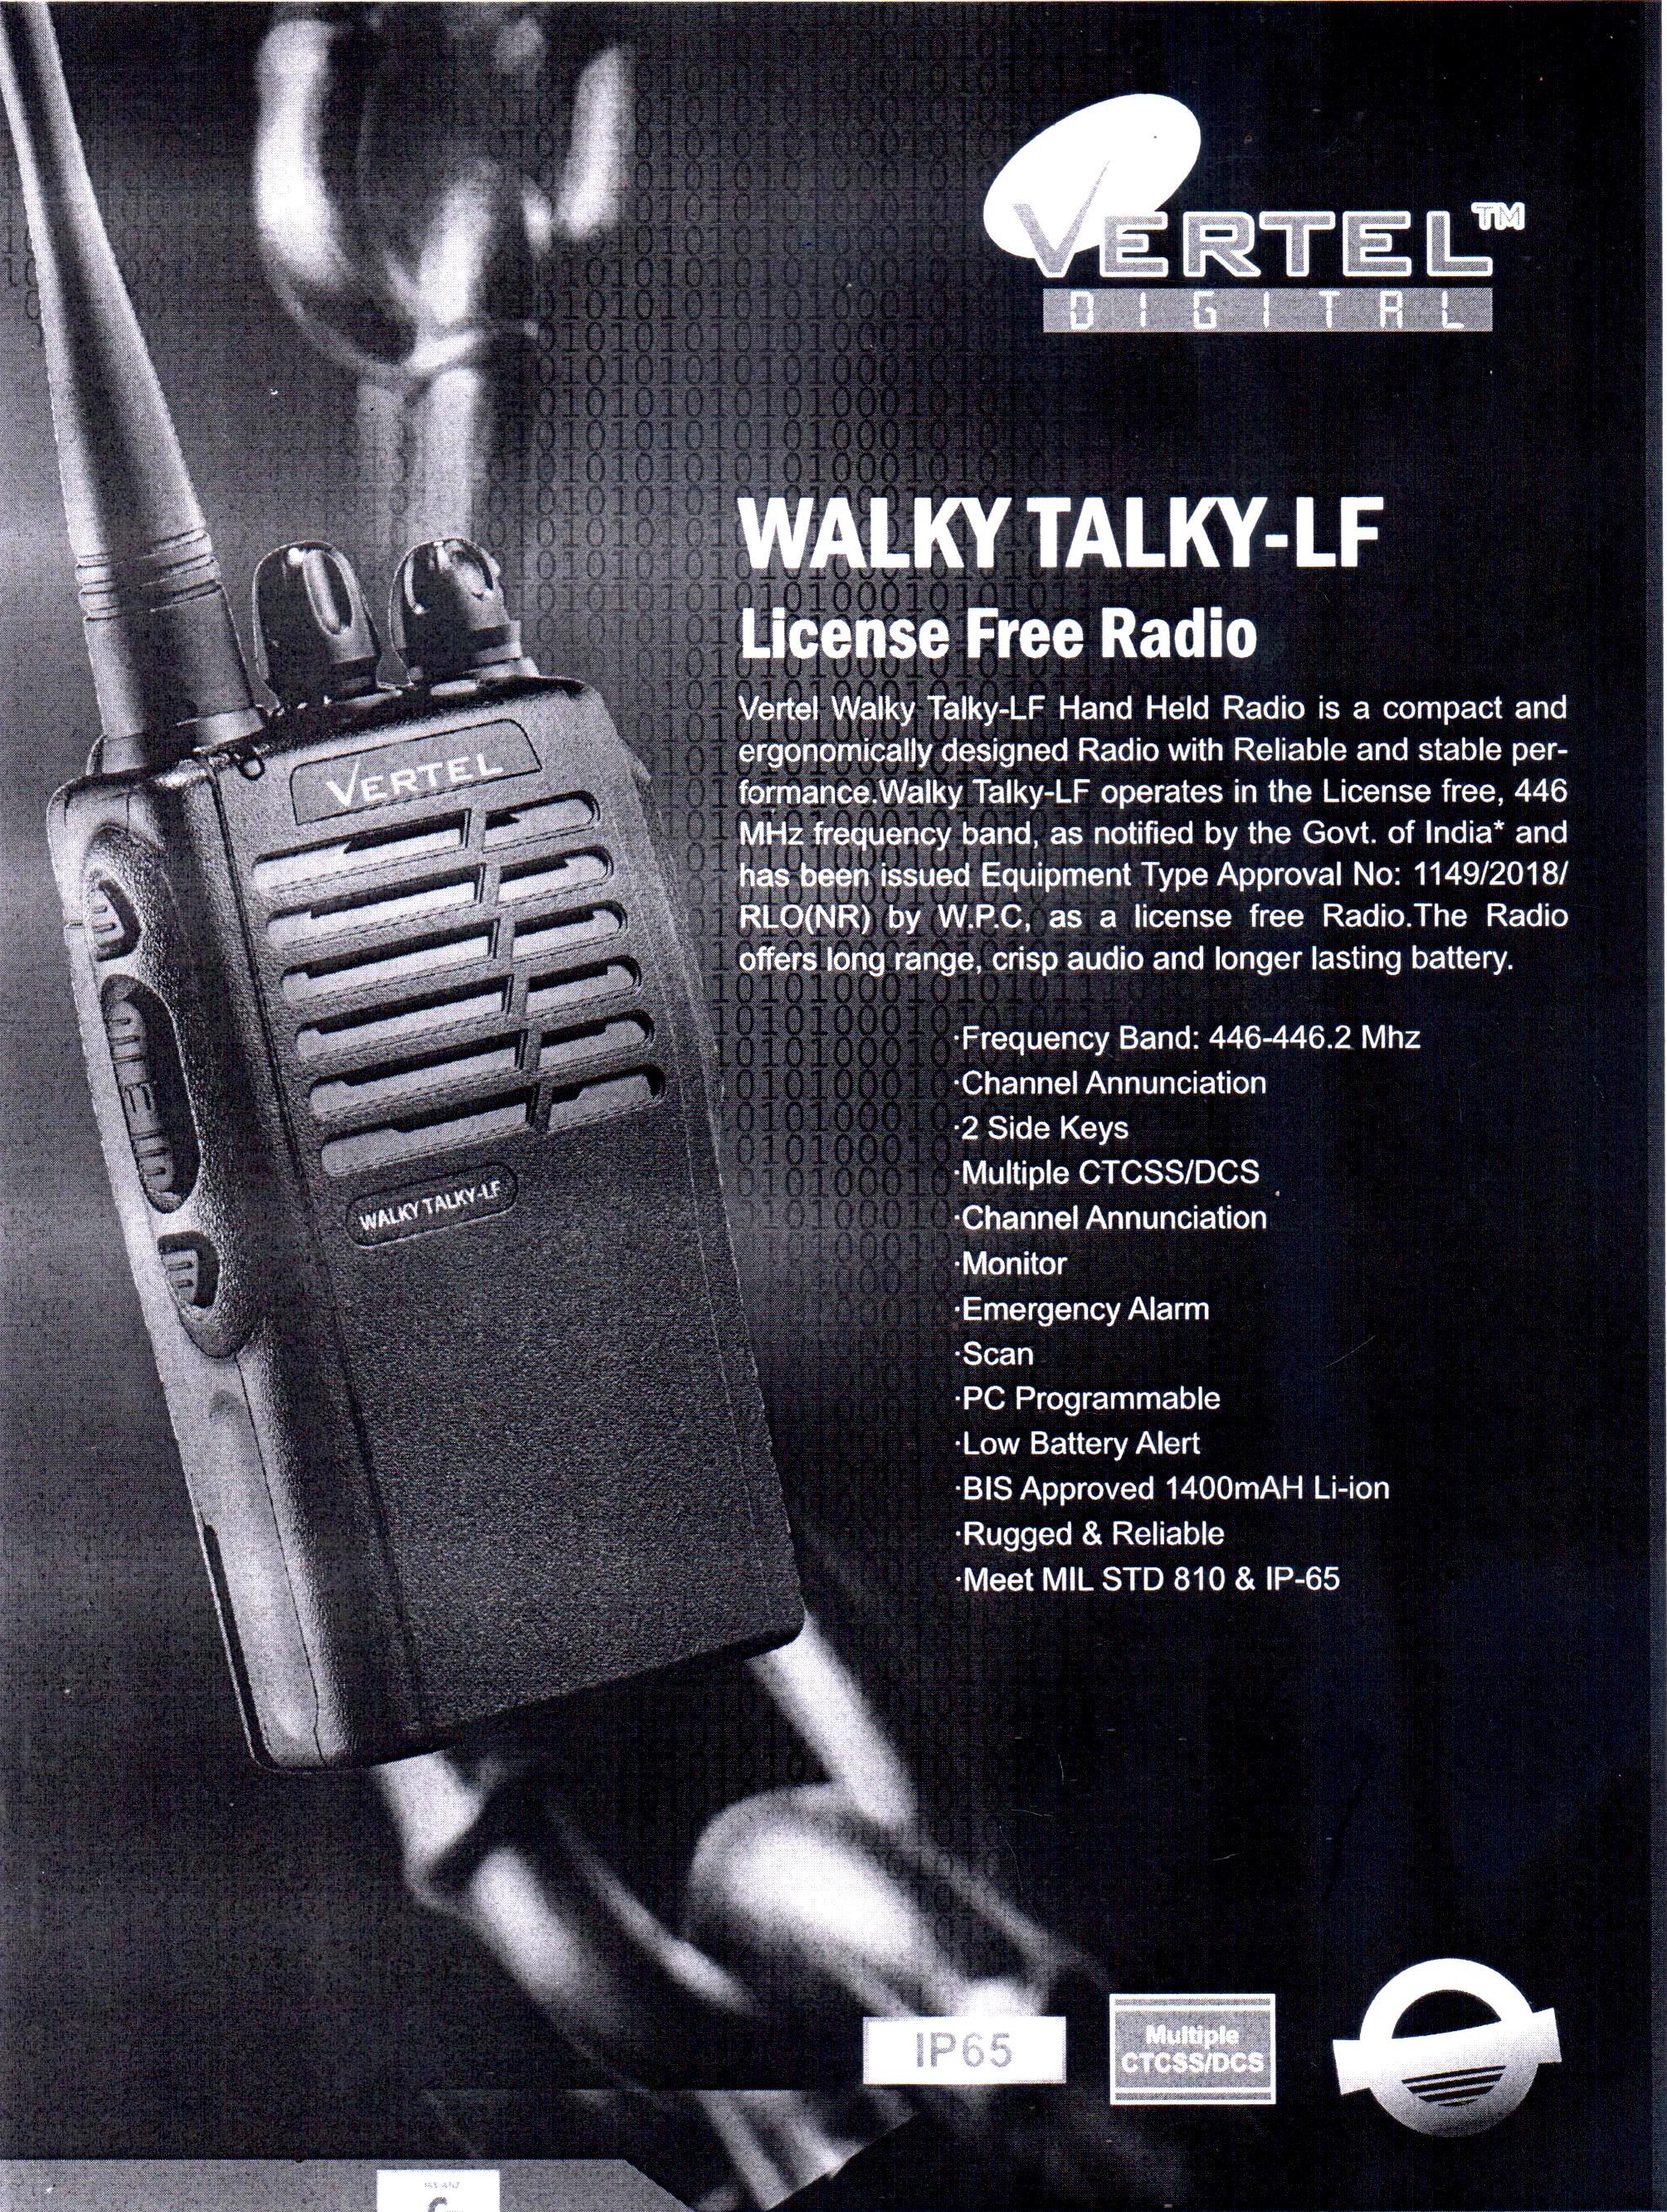 VERTEL WALKY TALKY LICENSE FREE RADIO_1